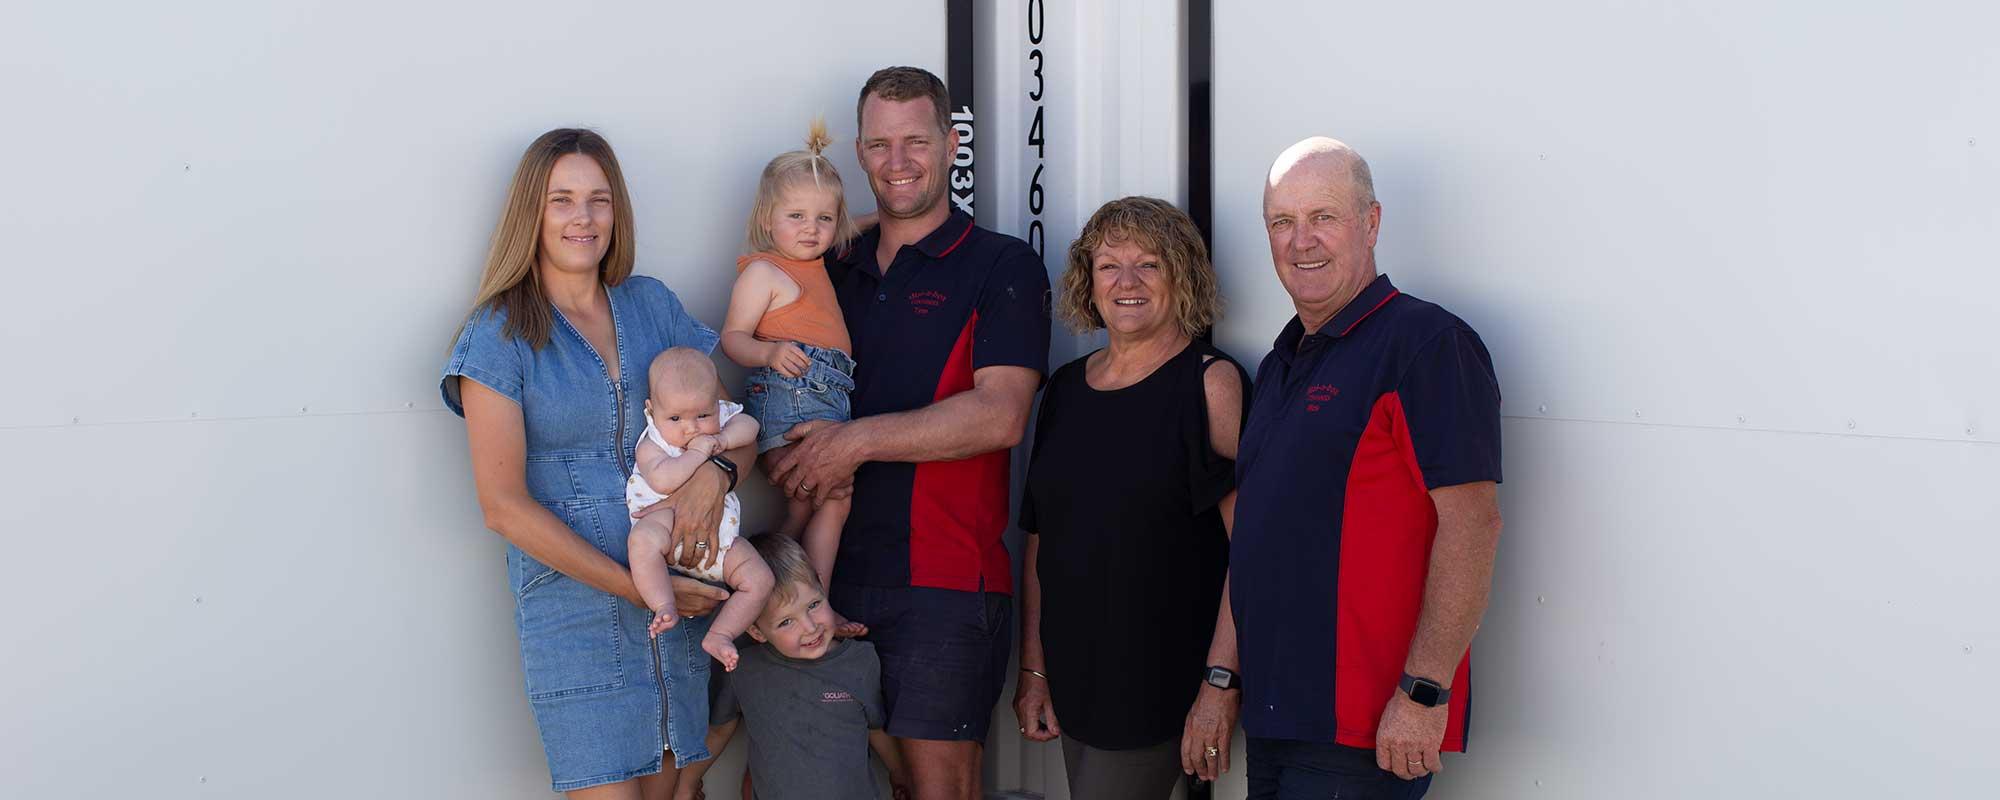 Local self storage Ballarat owned